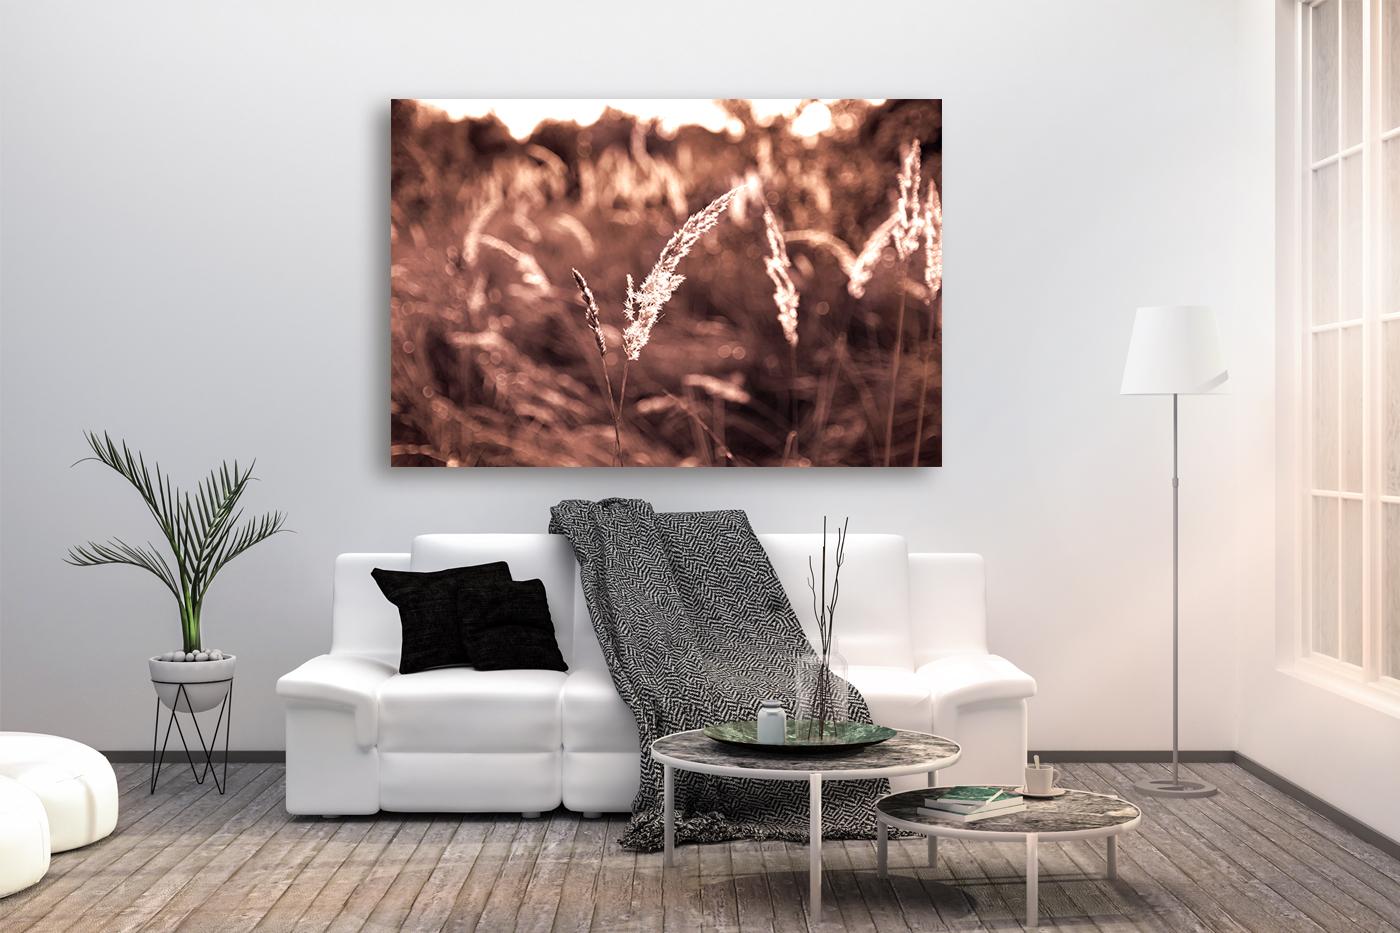 Nature photo, landscape photo, floral photo, flora photo example image 4